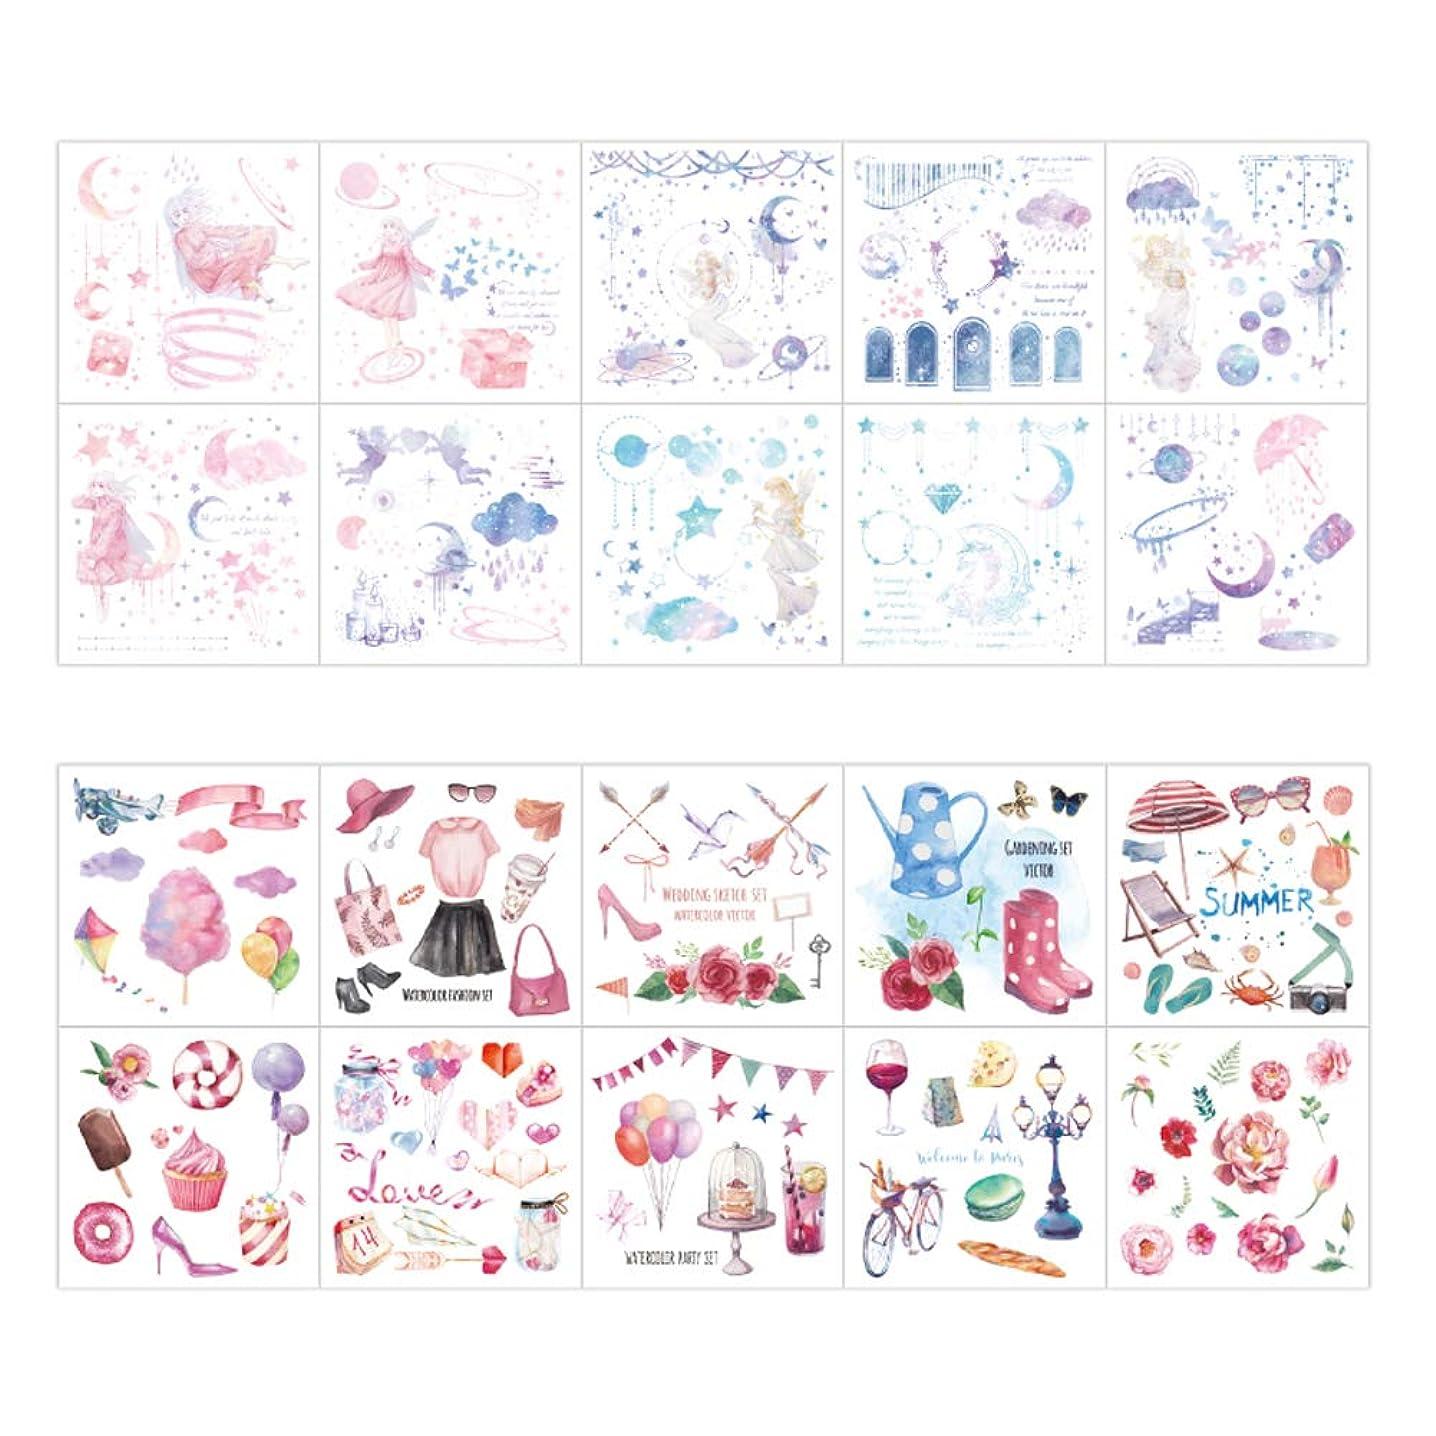 Cute Washi Paper Stationery Sticker Set Fantasy Girl Star Moon Fairy Summer Girl's Travel Stuff Dress Gardening Tool Heart Balloon Stickers for Scrapbooking Album Planner Diary Notebook DIY Craft (C)